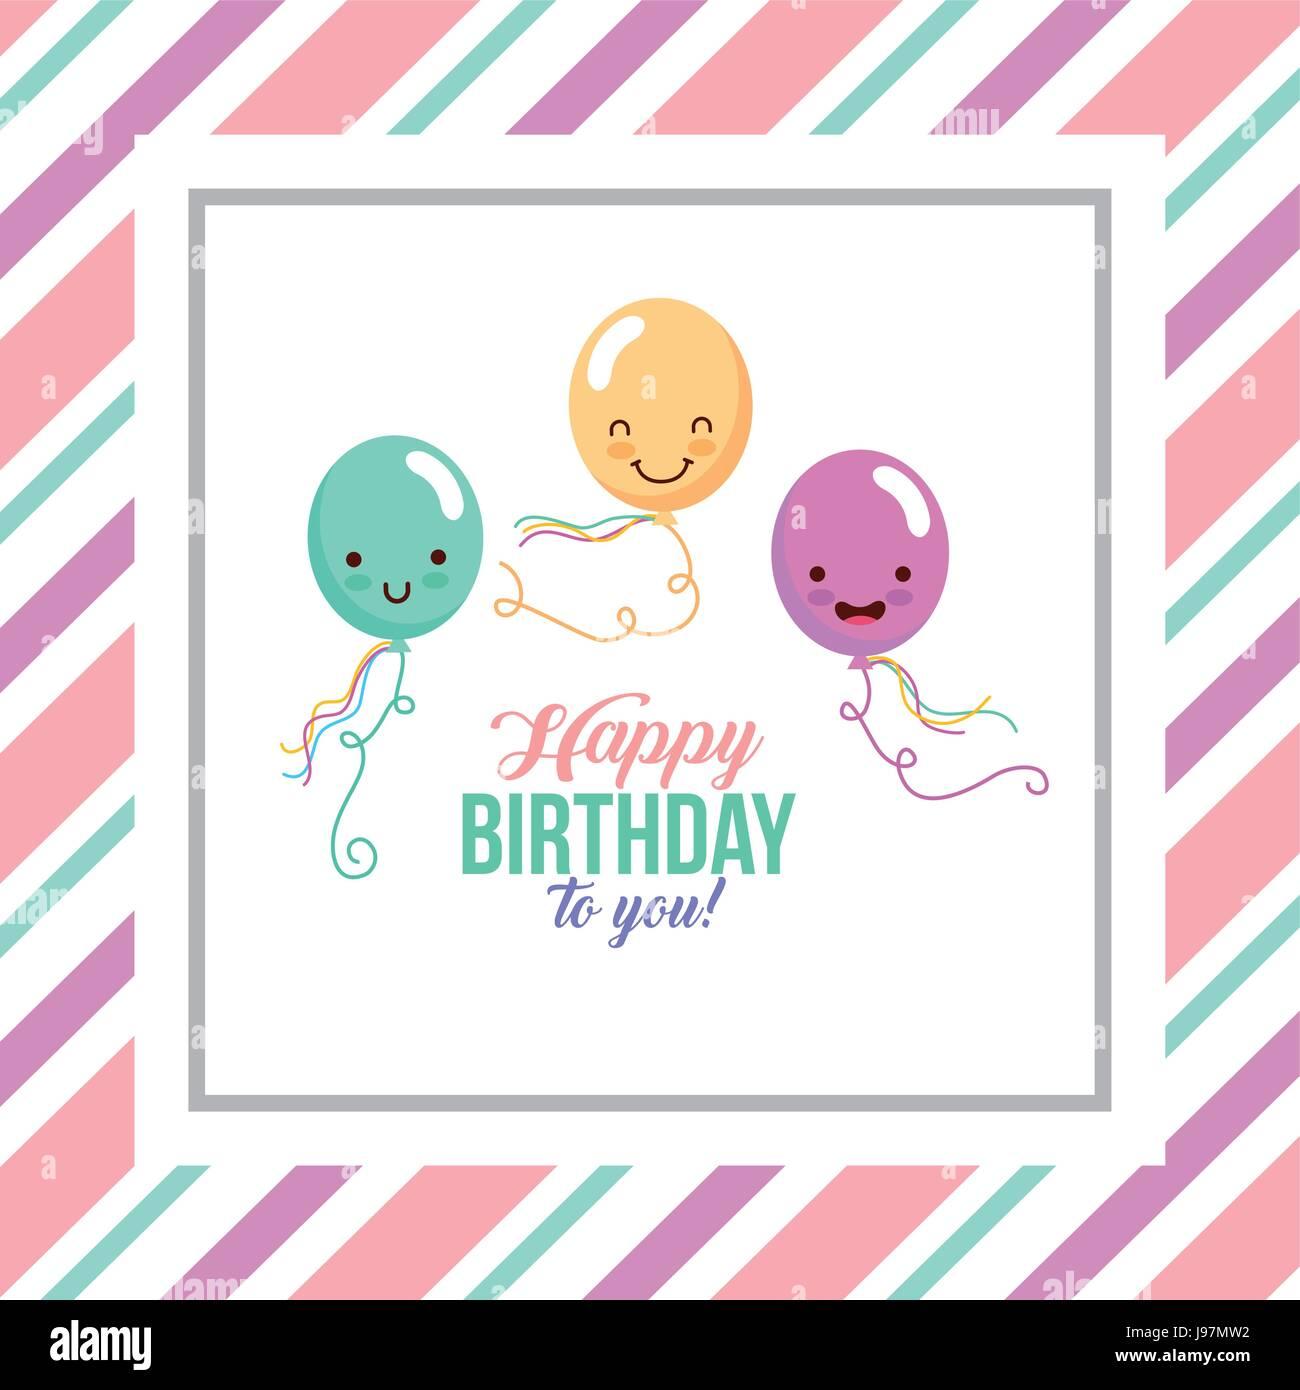 Feliz Cumpleanos Kawaii Ballons Ilustracion Del Vector Imagen